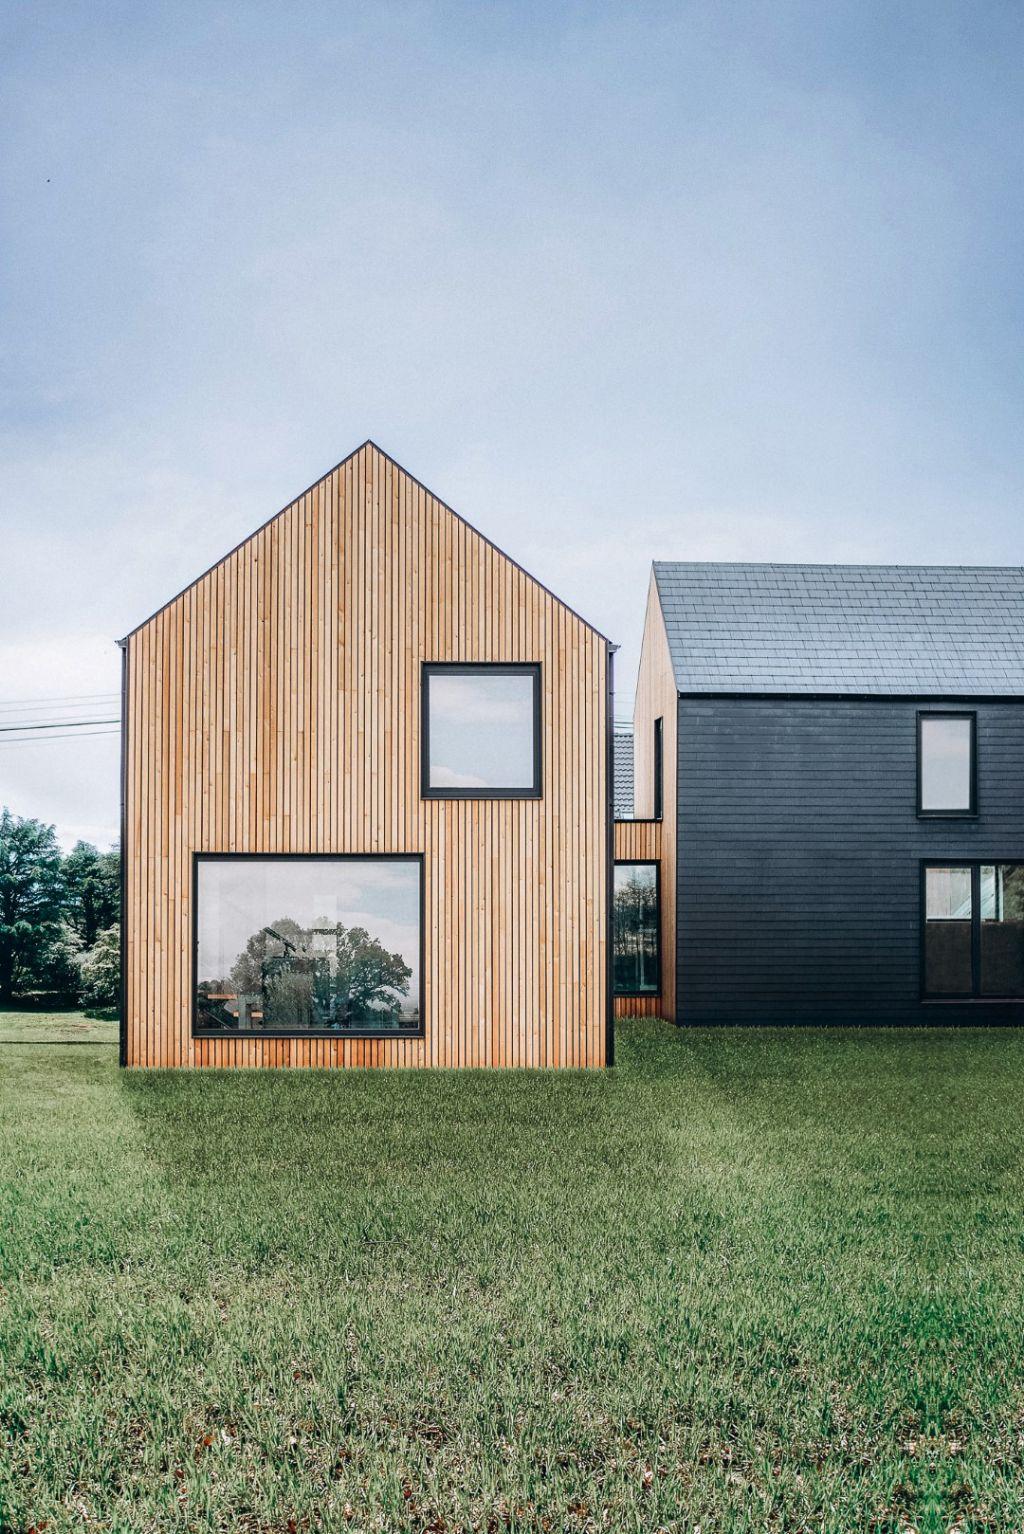 Light.house à Fernelmont, avec bardage bois et ardoise